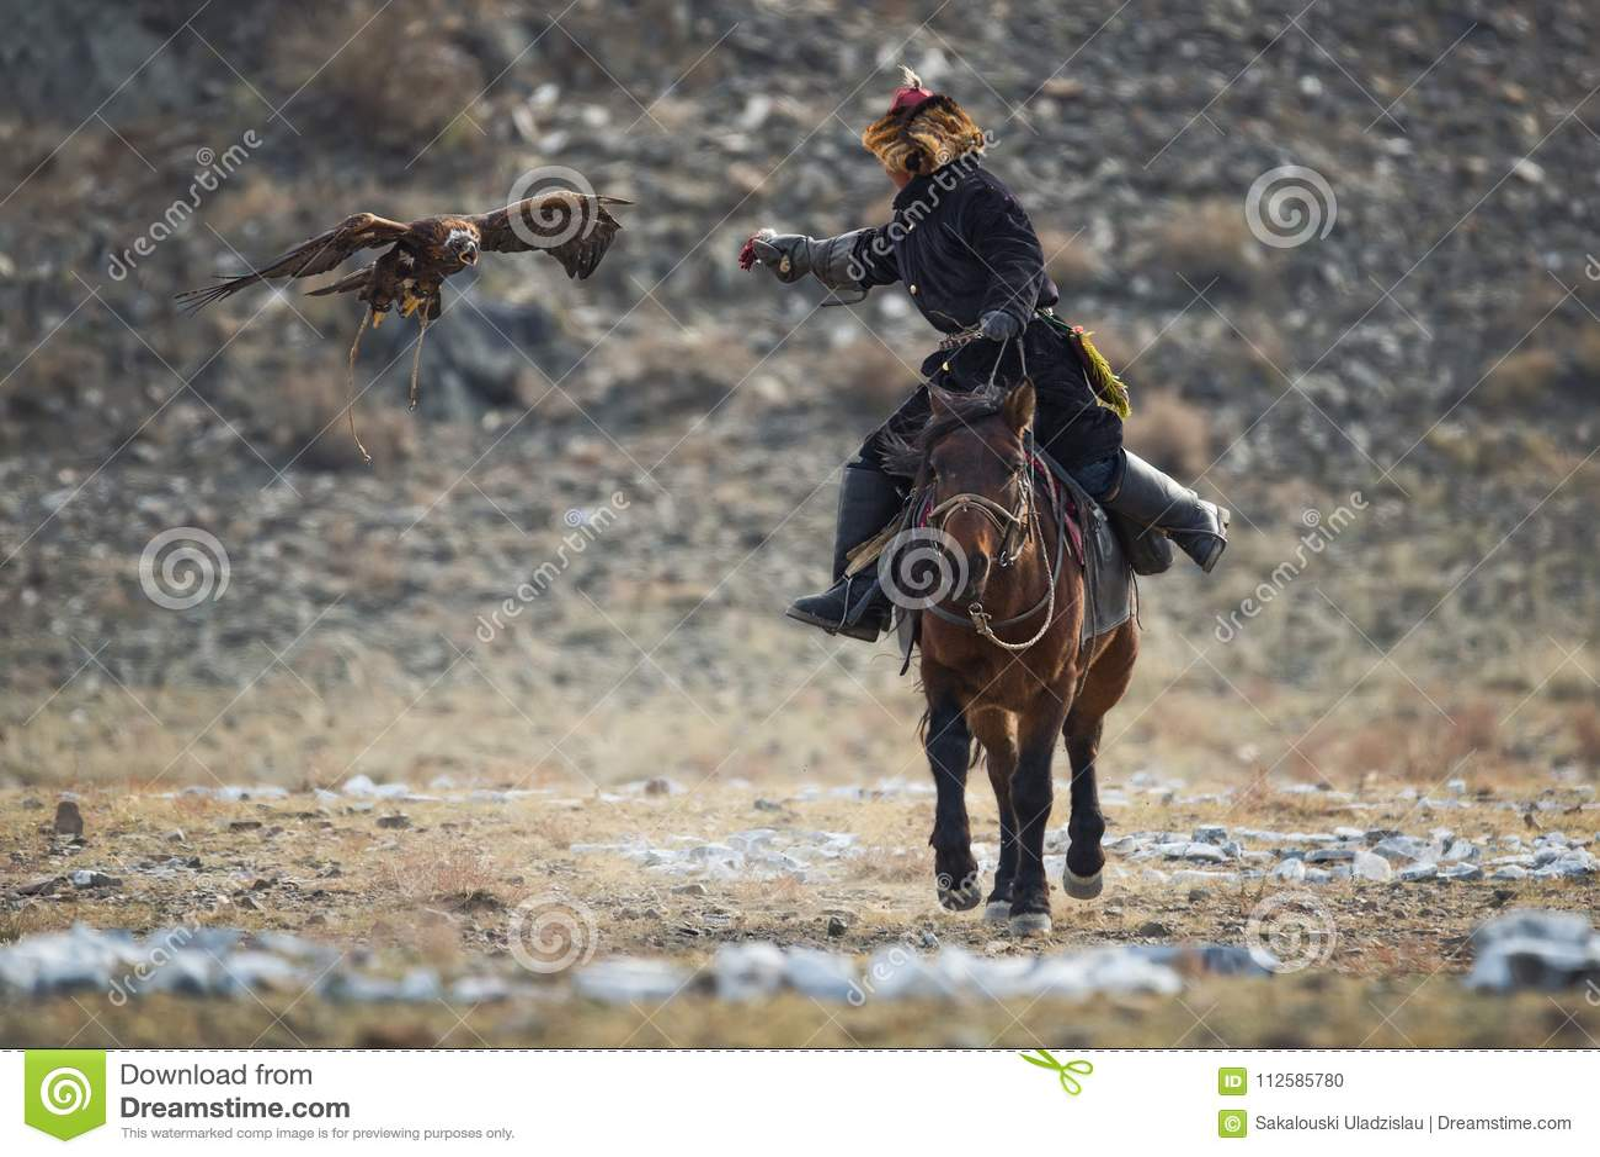 Goldener Eagle Attacks Prey West-Mongolei Traditioneller goldener Eagle Festival Unbekannter Mongolian Hunter So Called Berkutchi